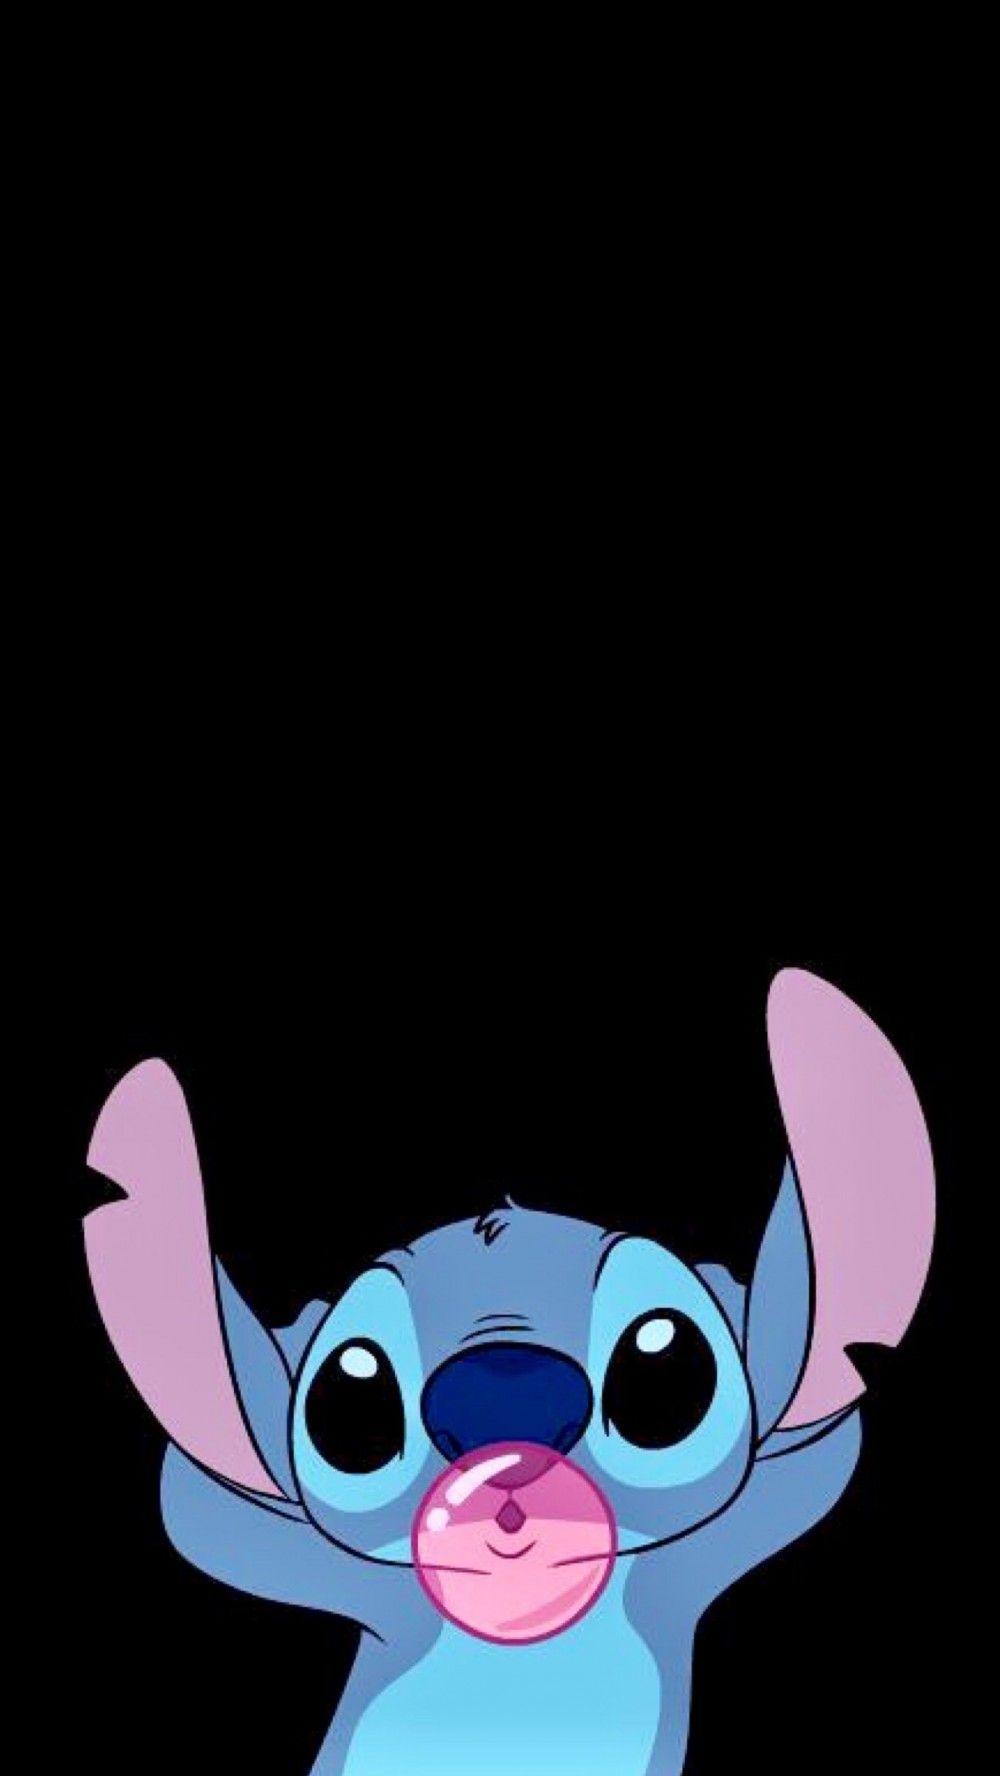 20 Fonds D Ecran Iphone Mignons Disney Stitch Pour Votre Iphone Fond D Ecran Telephone Fond D Ecran Dessin Lilo Et Stitch